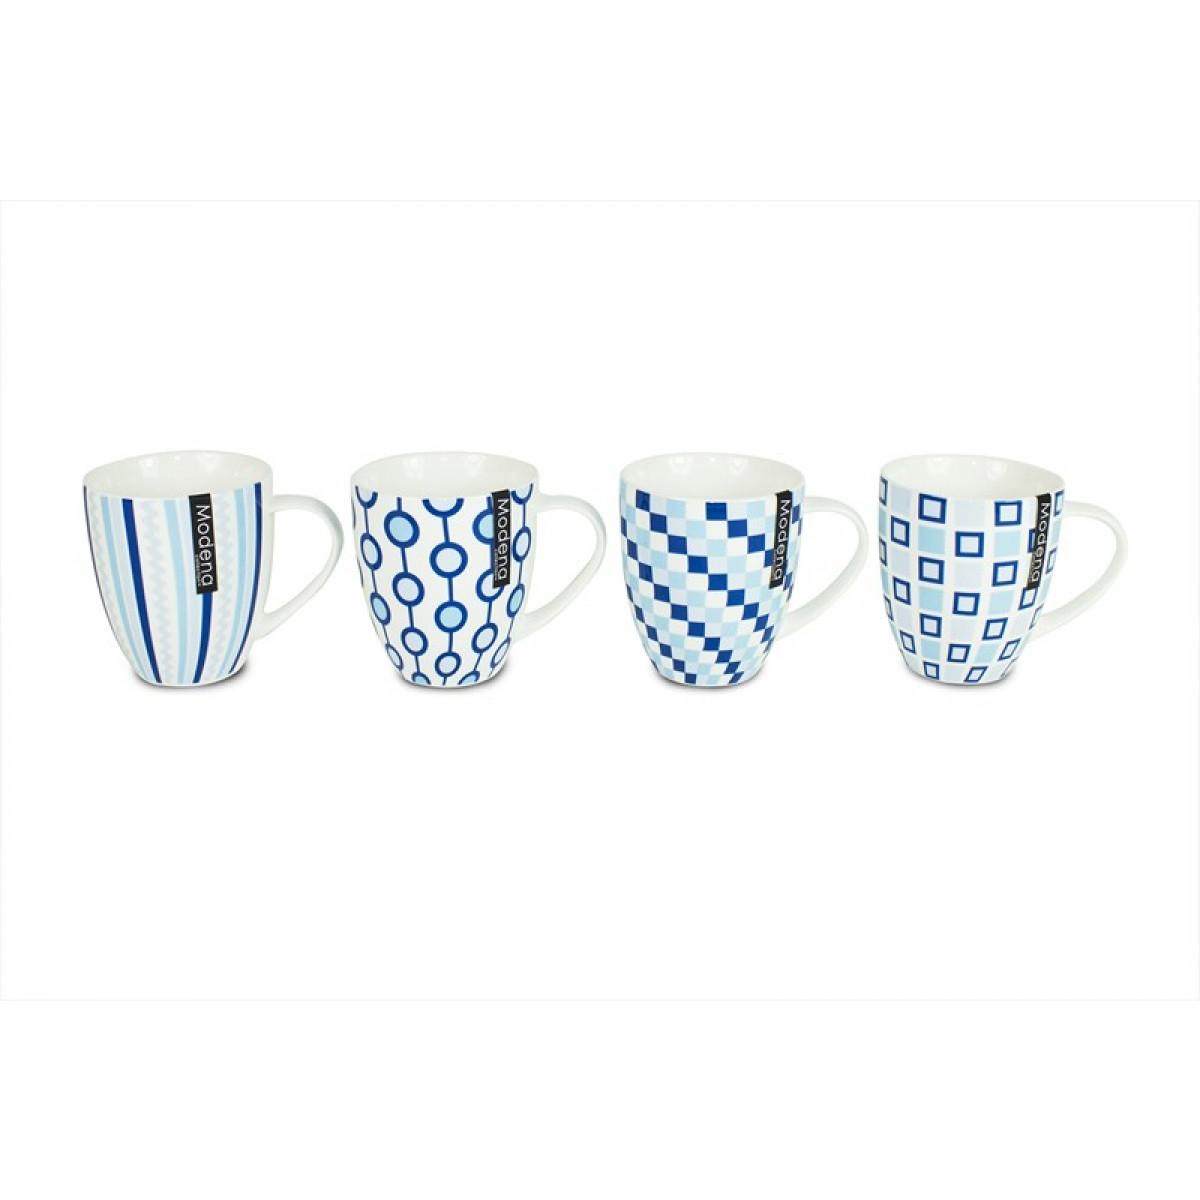 New China 16oz 4 Designs Mugs Bone c354ARjLqS